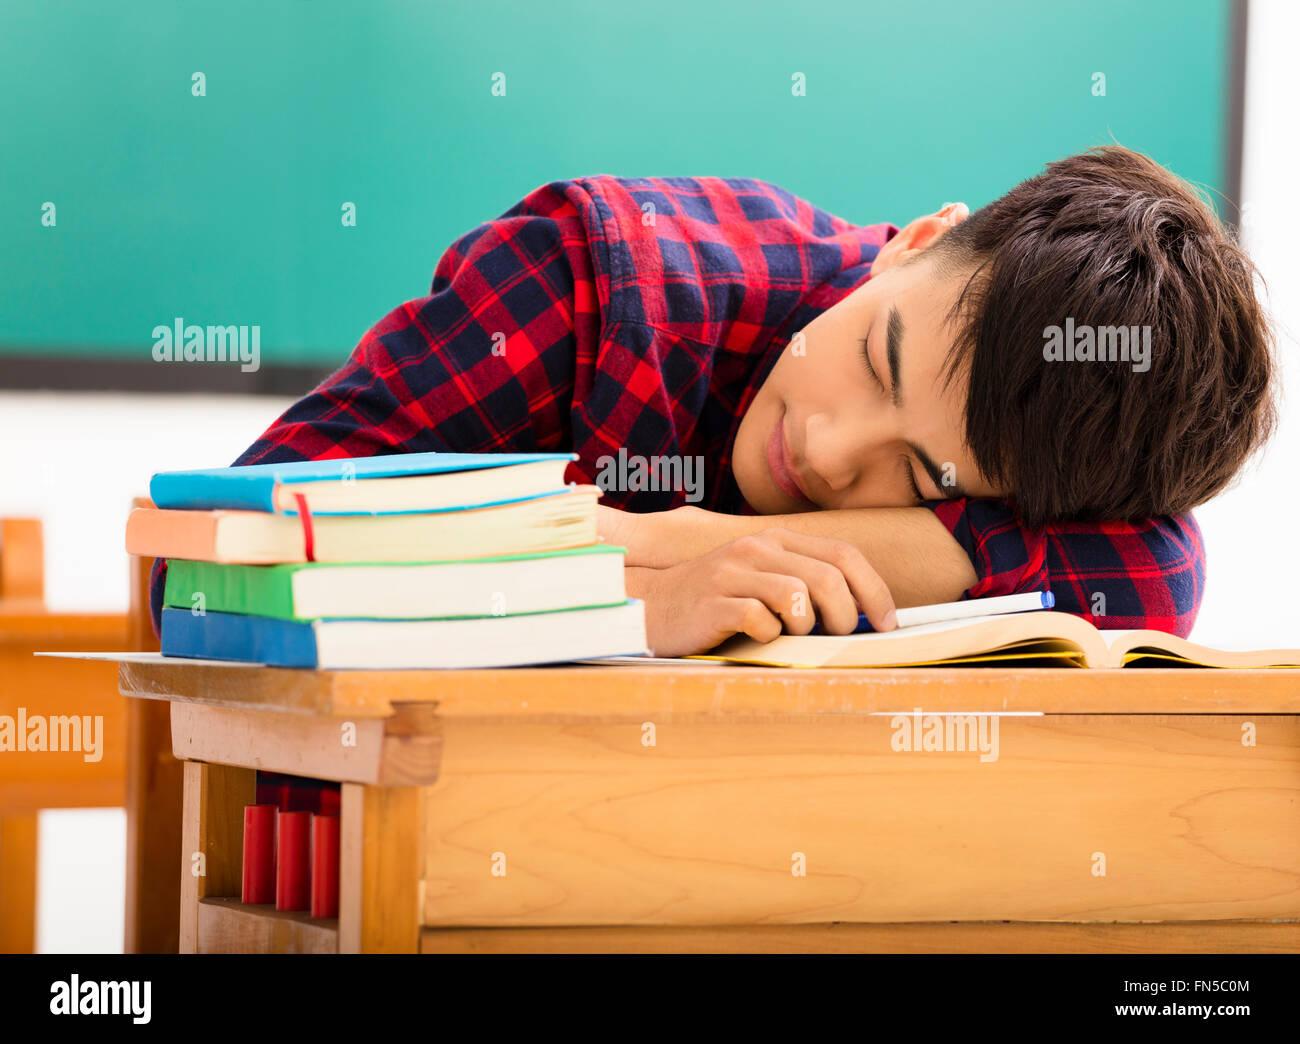 Someone School Desk Sleeping